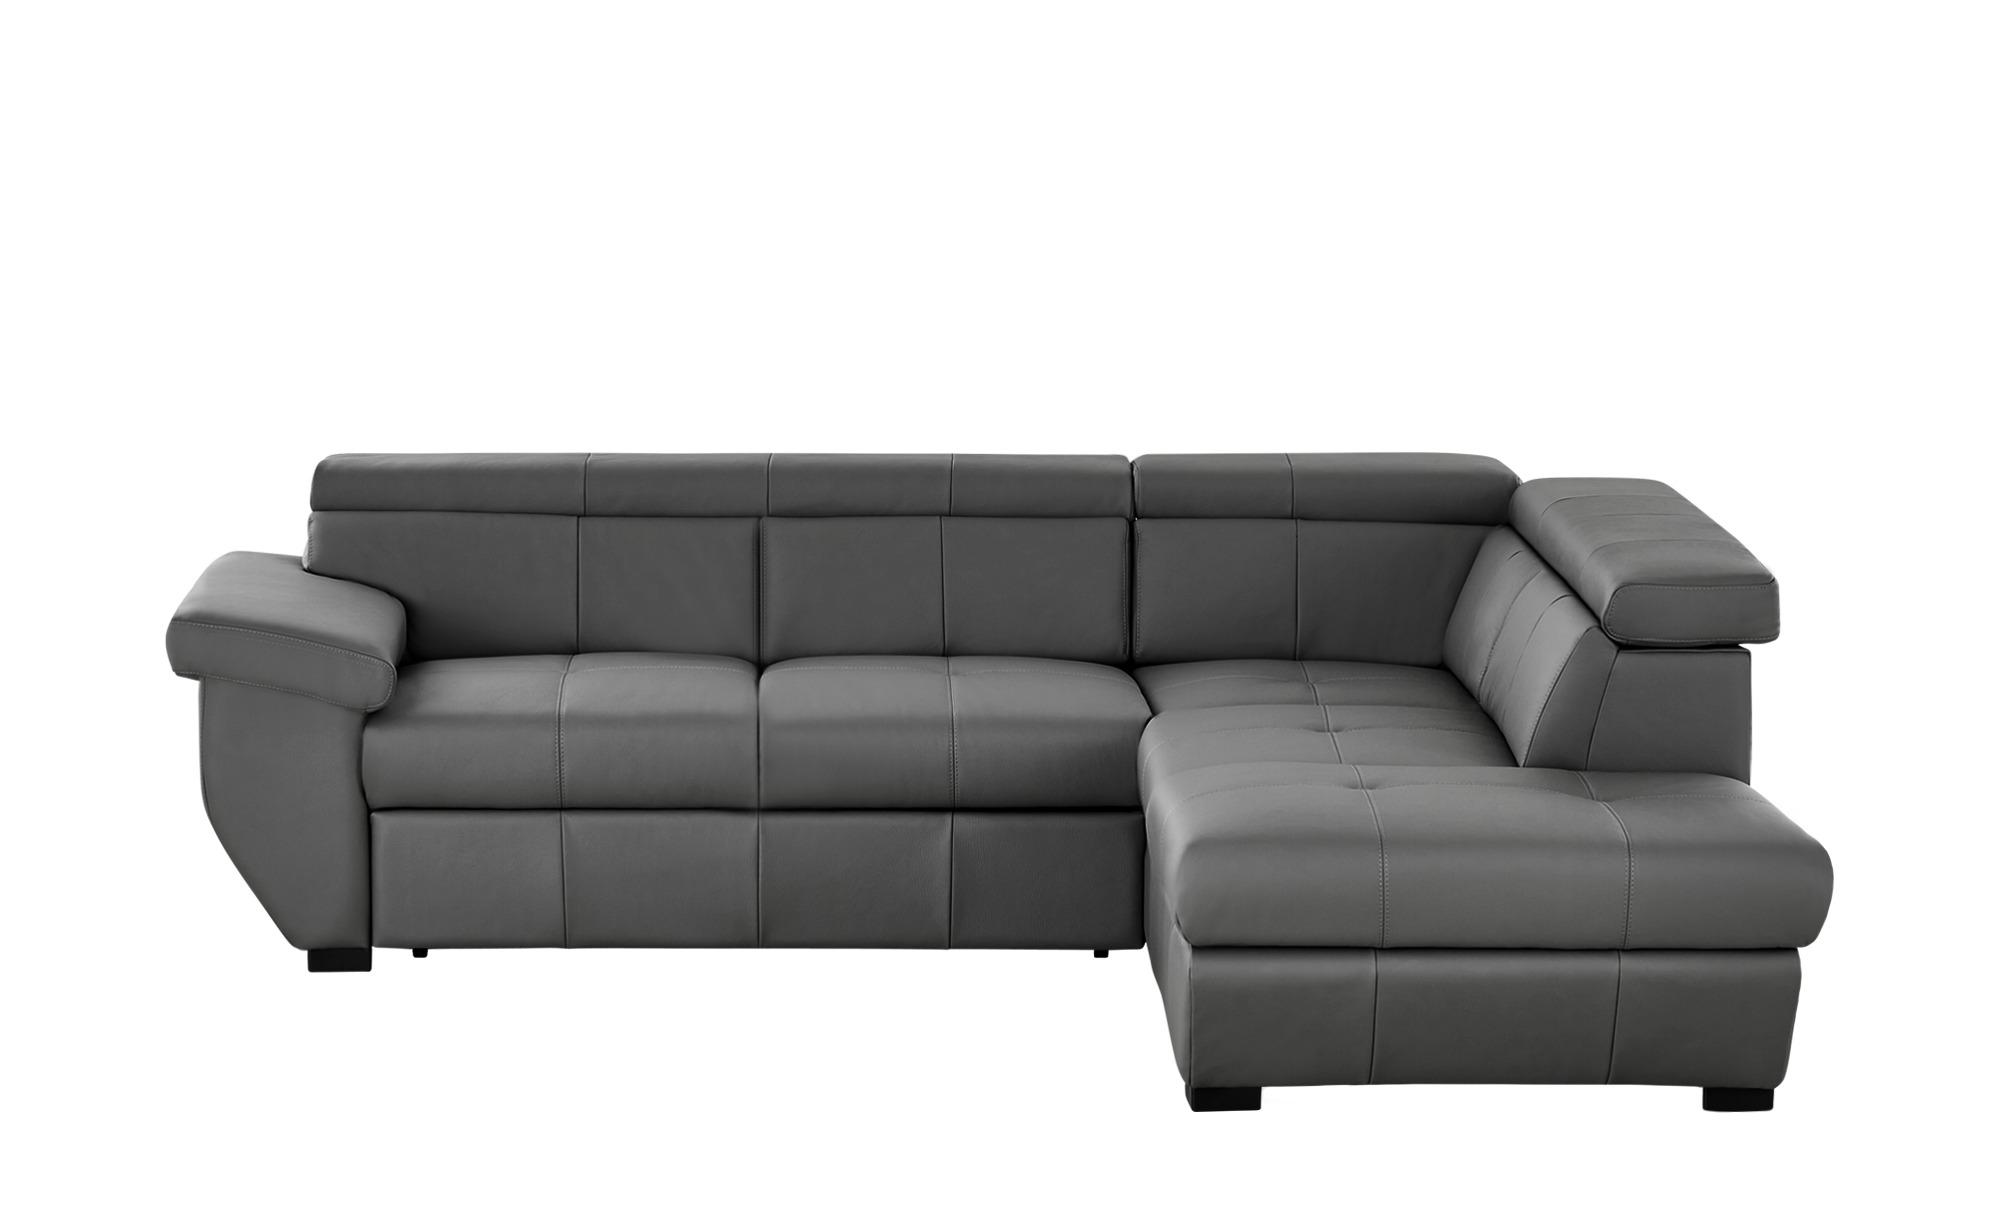 Couch Billig Preis Ecksofa Mit Schlaffunktion Lederimitat Kunstleder Sofa Kaufen Sofa Design Institute Face Moderne Couch Dunkelgraues Sofa Ecksofa Braun